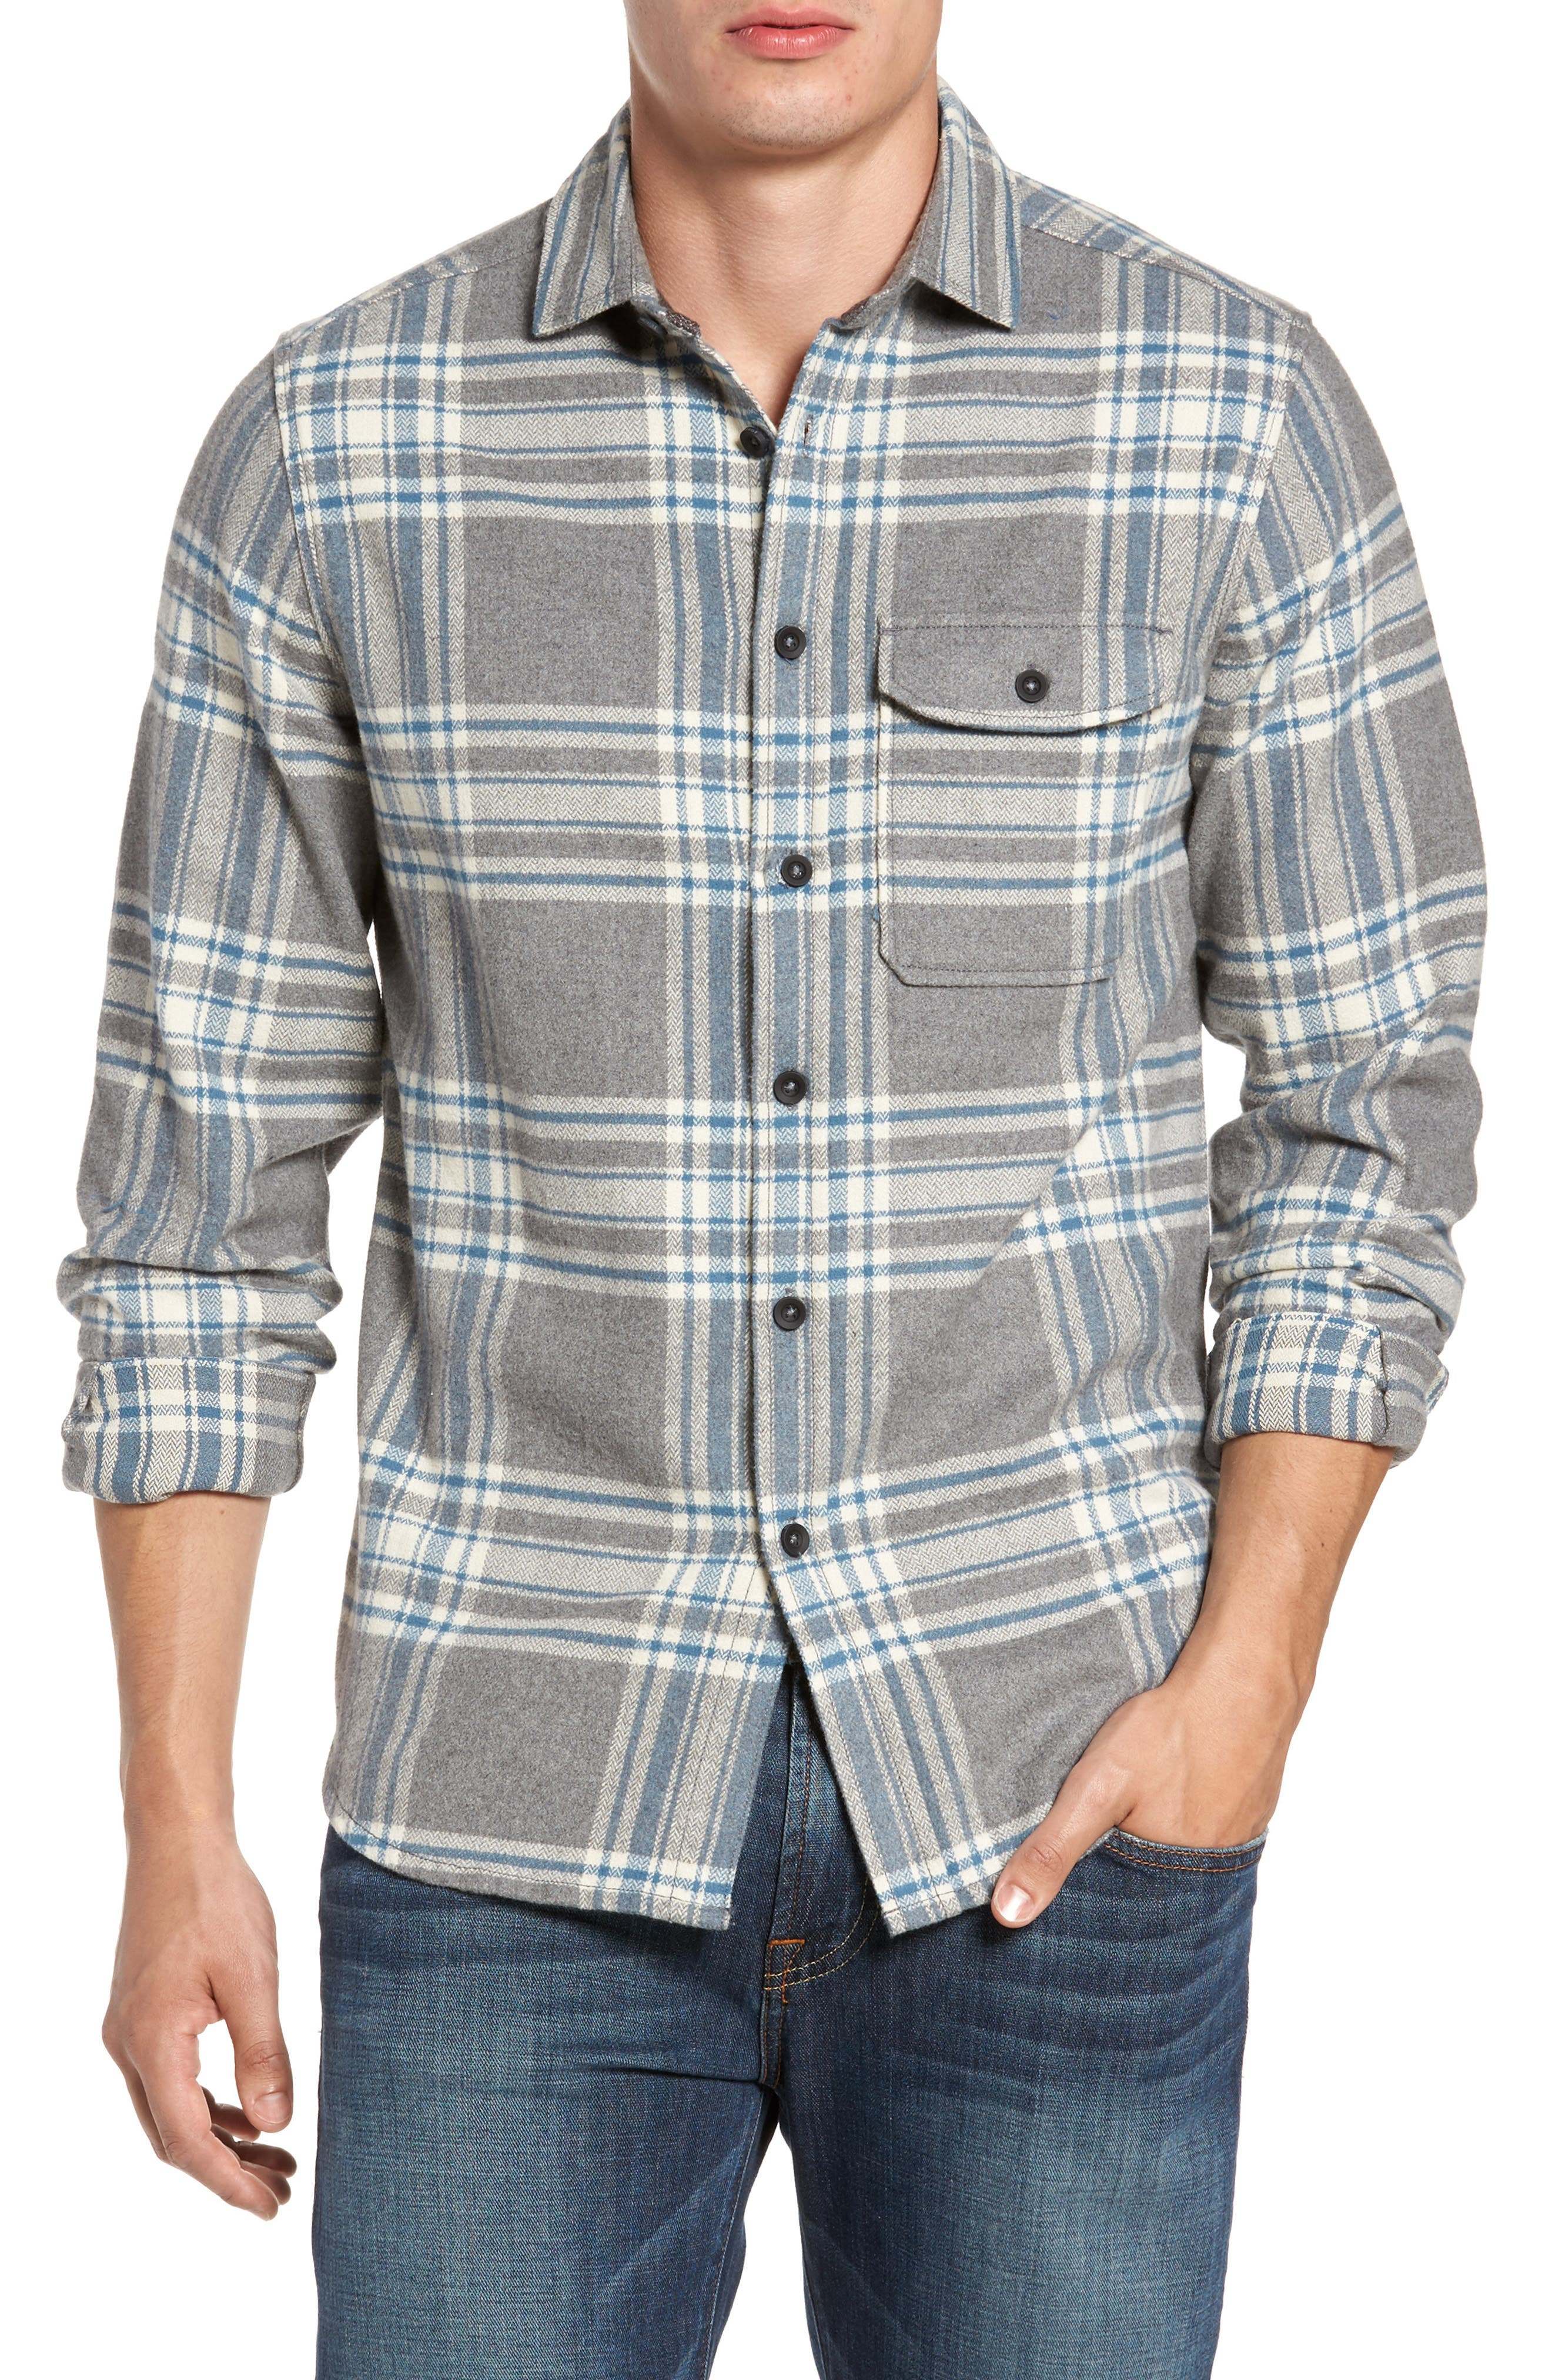 Main Image - Jeremiah Marin Herringbone Plaid Flannel Shirt